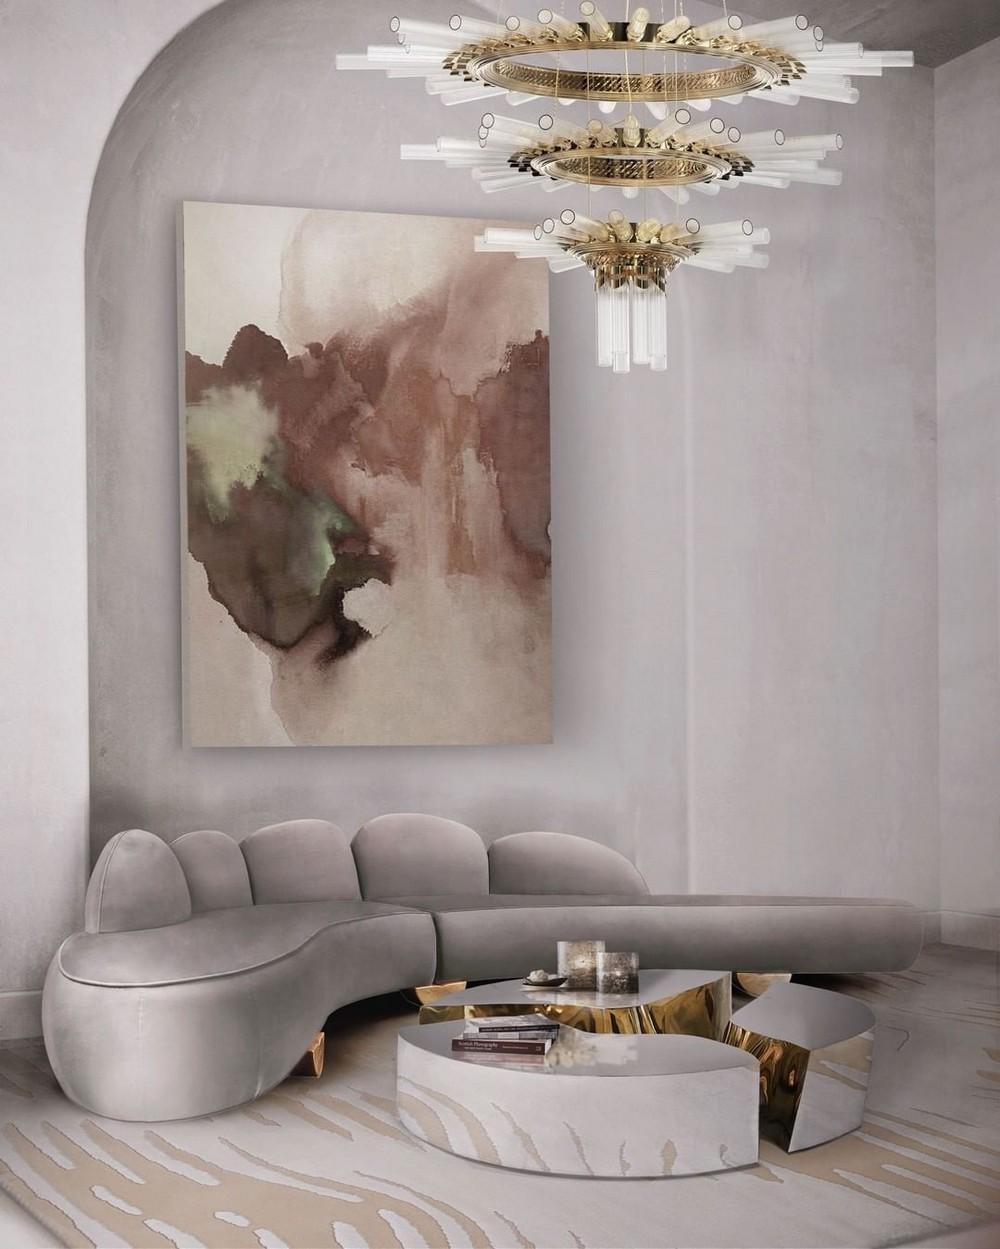 living room ideas 18 Living Room Ideas And Essentials – PART III 12 2